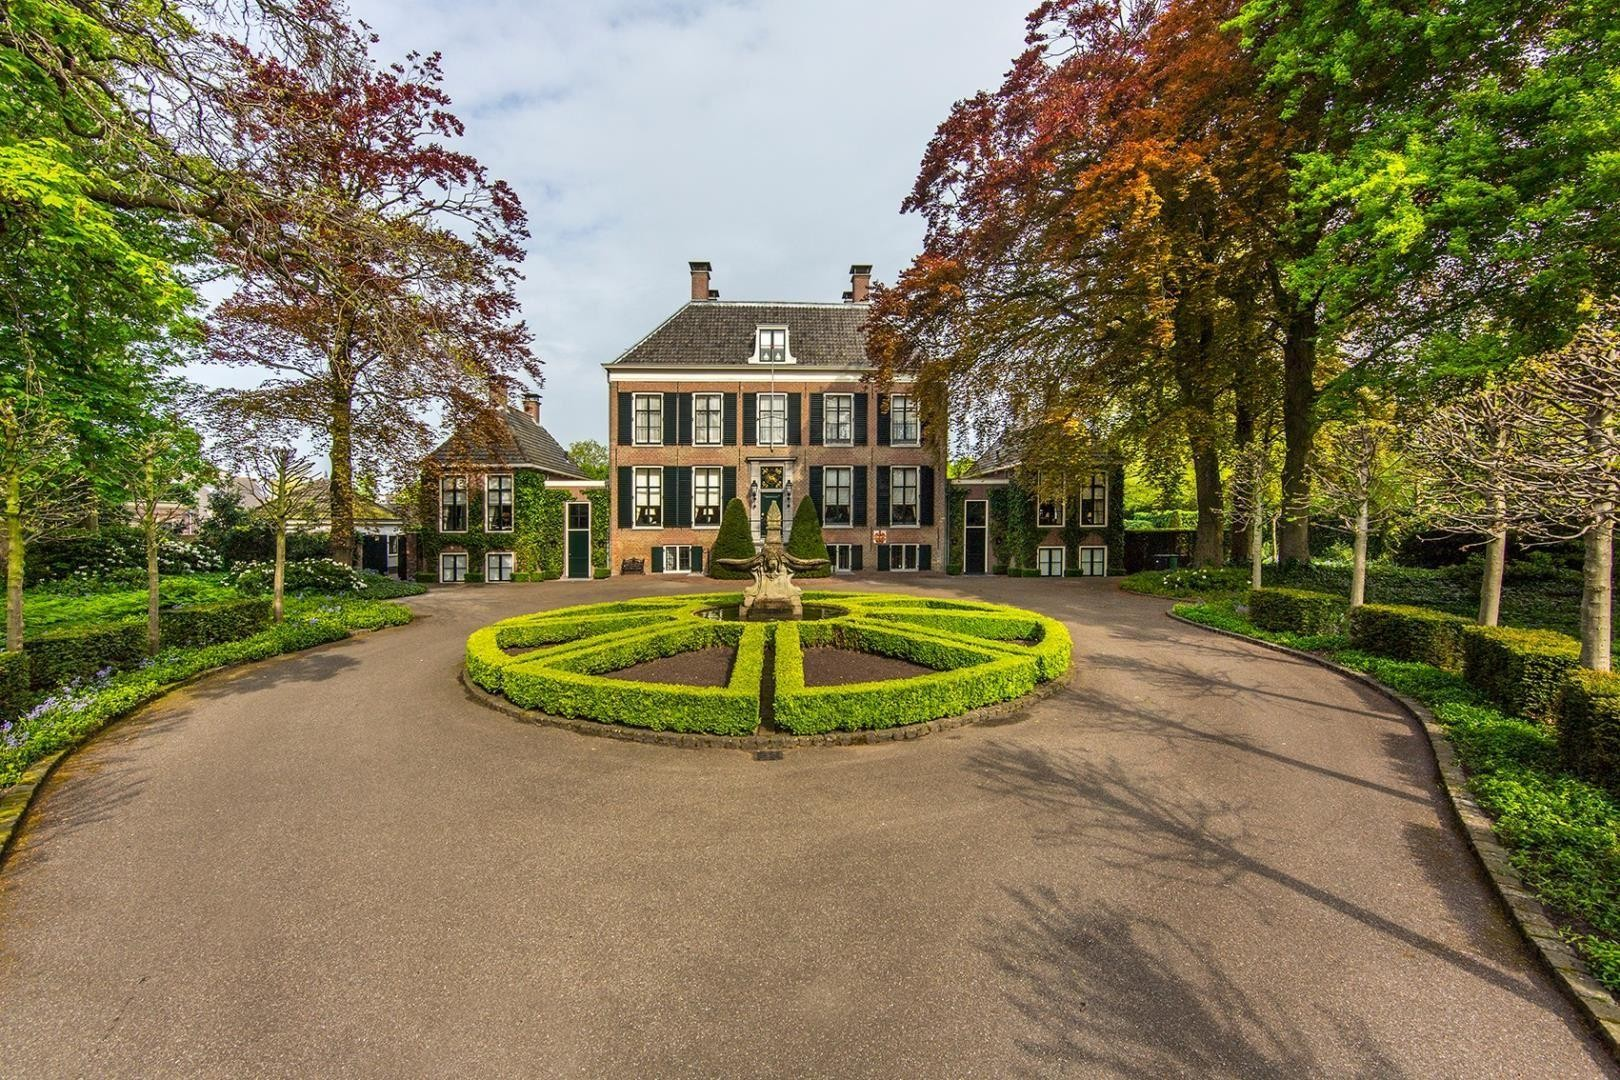 Stichting Oud Sassenheim presenteert boek over Oude Koningsh... - Leidsch Dagblad